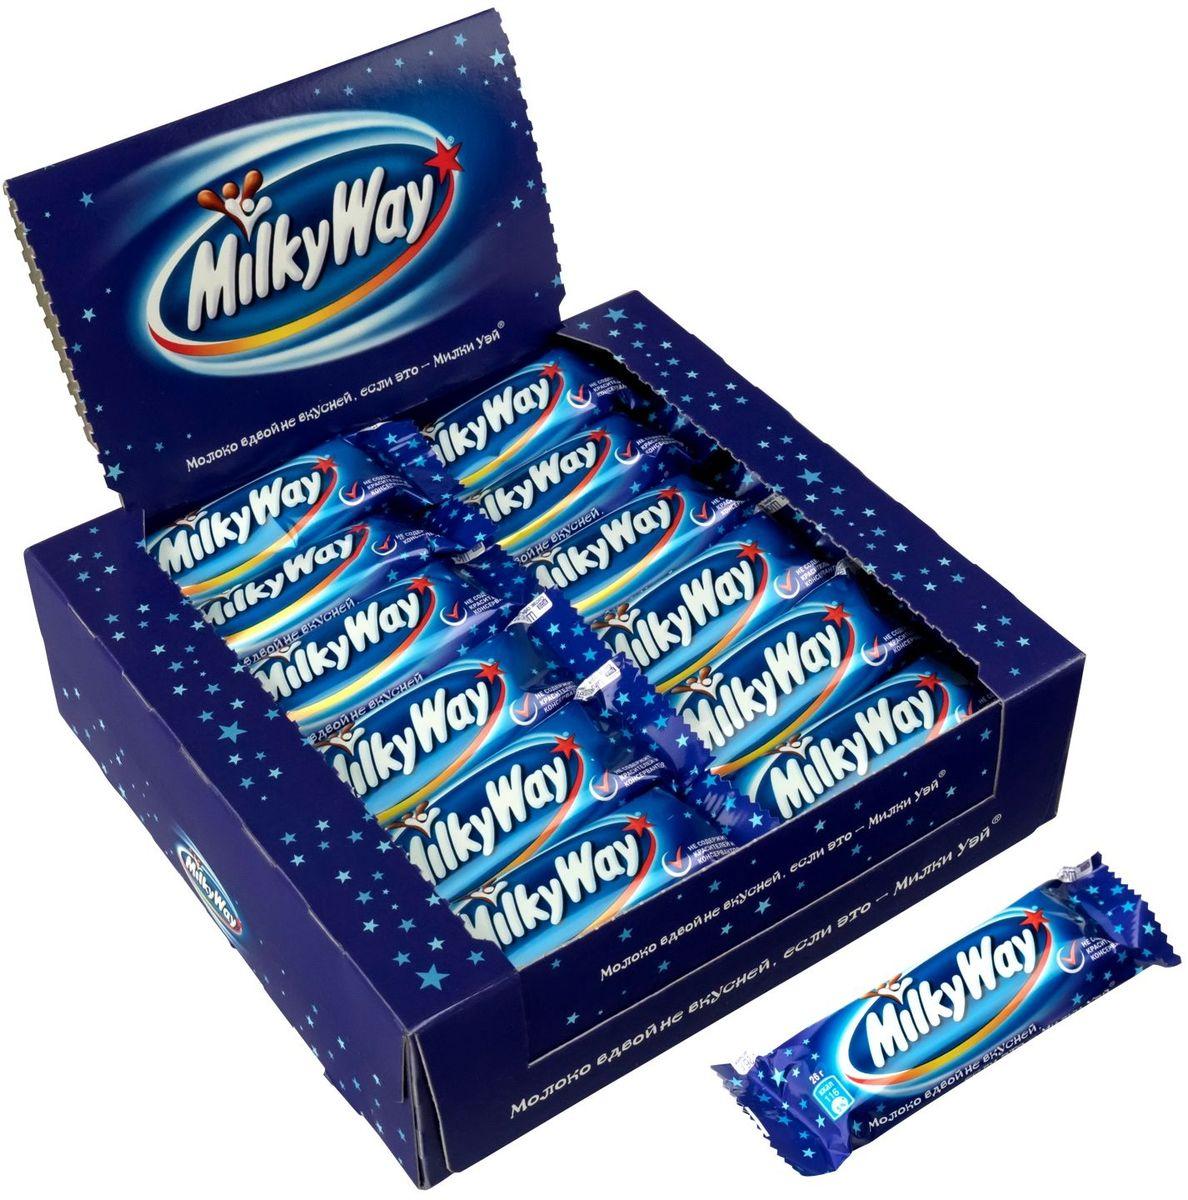 Milky way шоколадный батончик, 36 шт по 26 г подарочный набор milky way кормушка 155 г